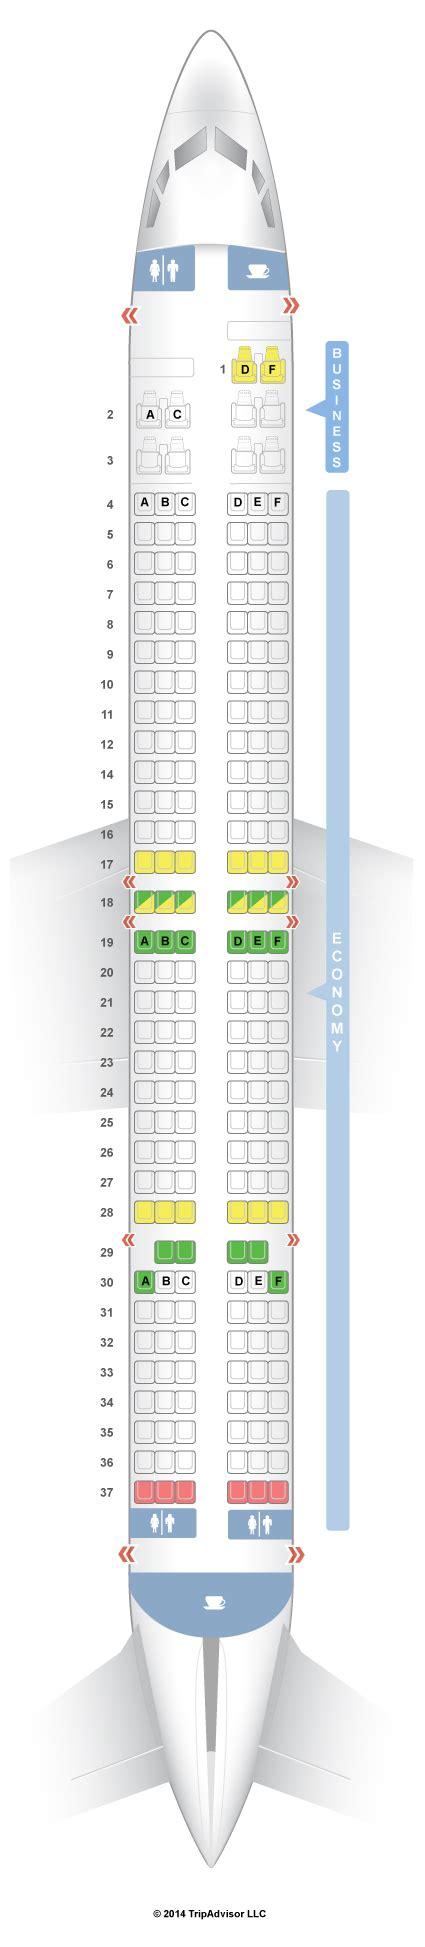 batik air seat seatguru seat map lion airlines boeing 737 900 739 v2